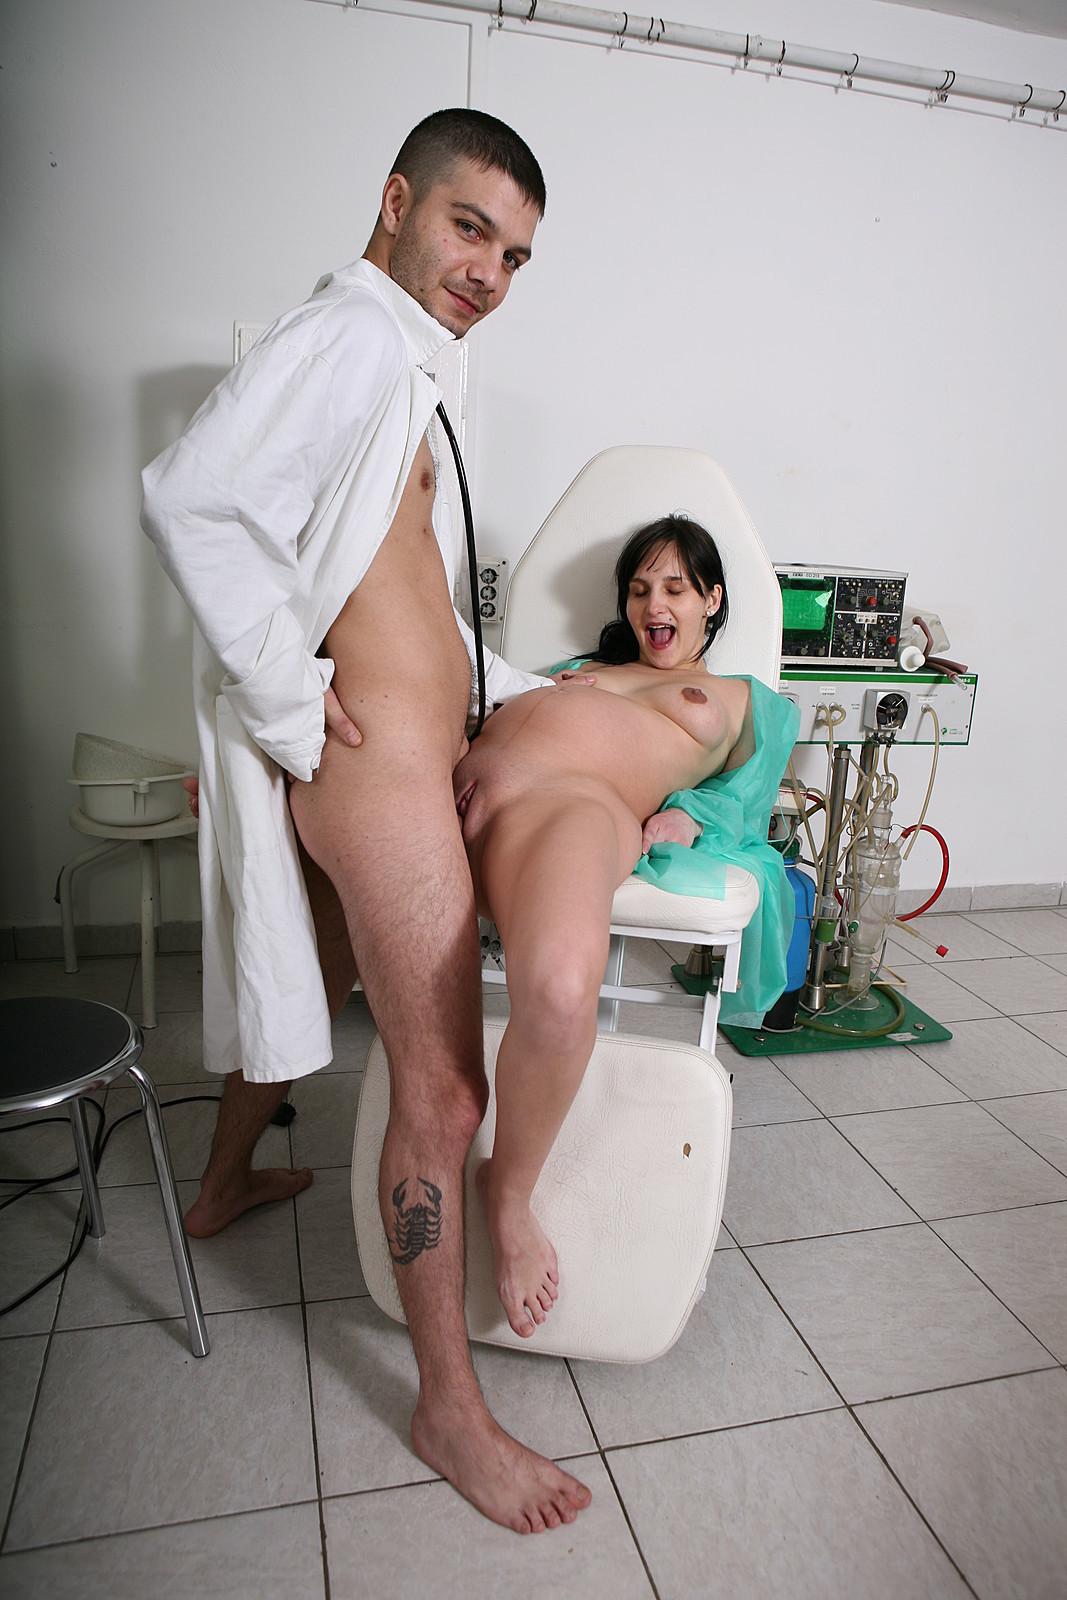 beremennie-doktor-porno